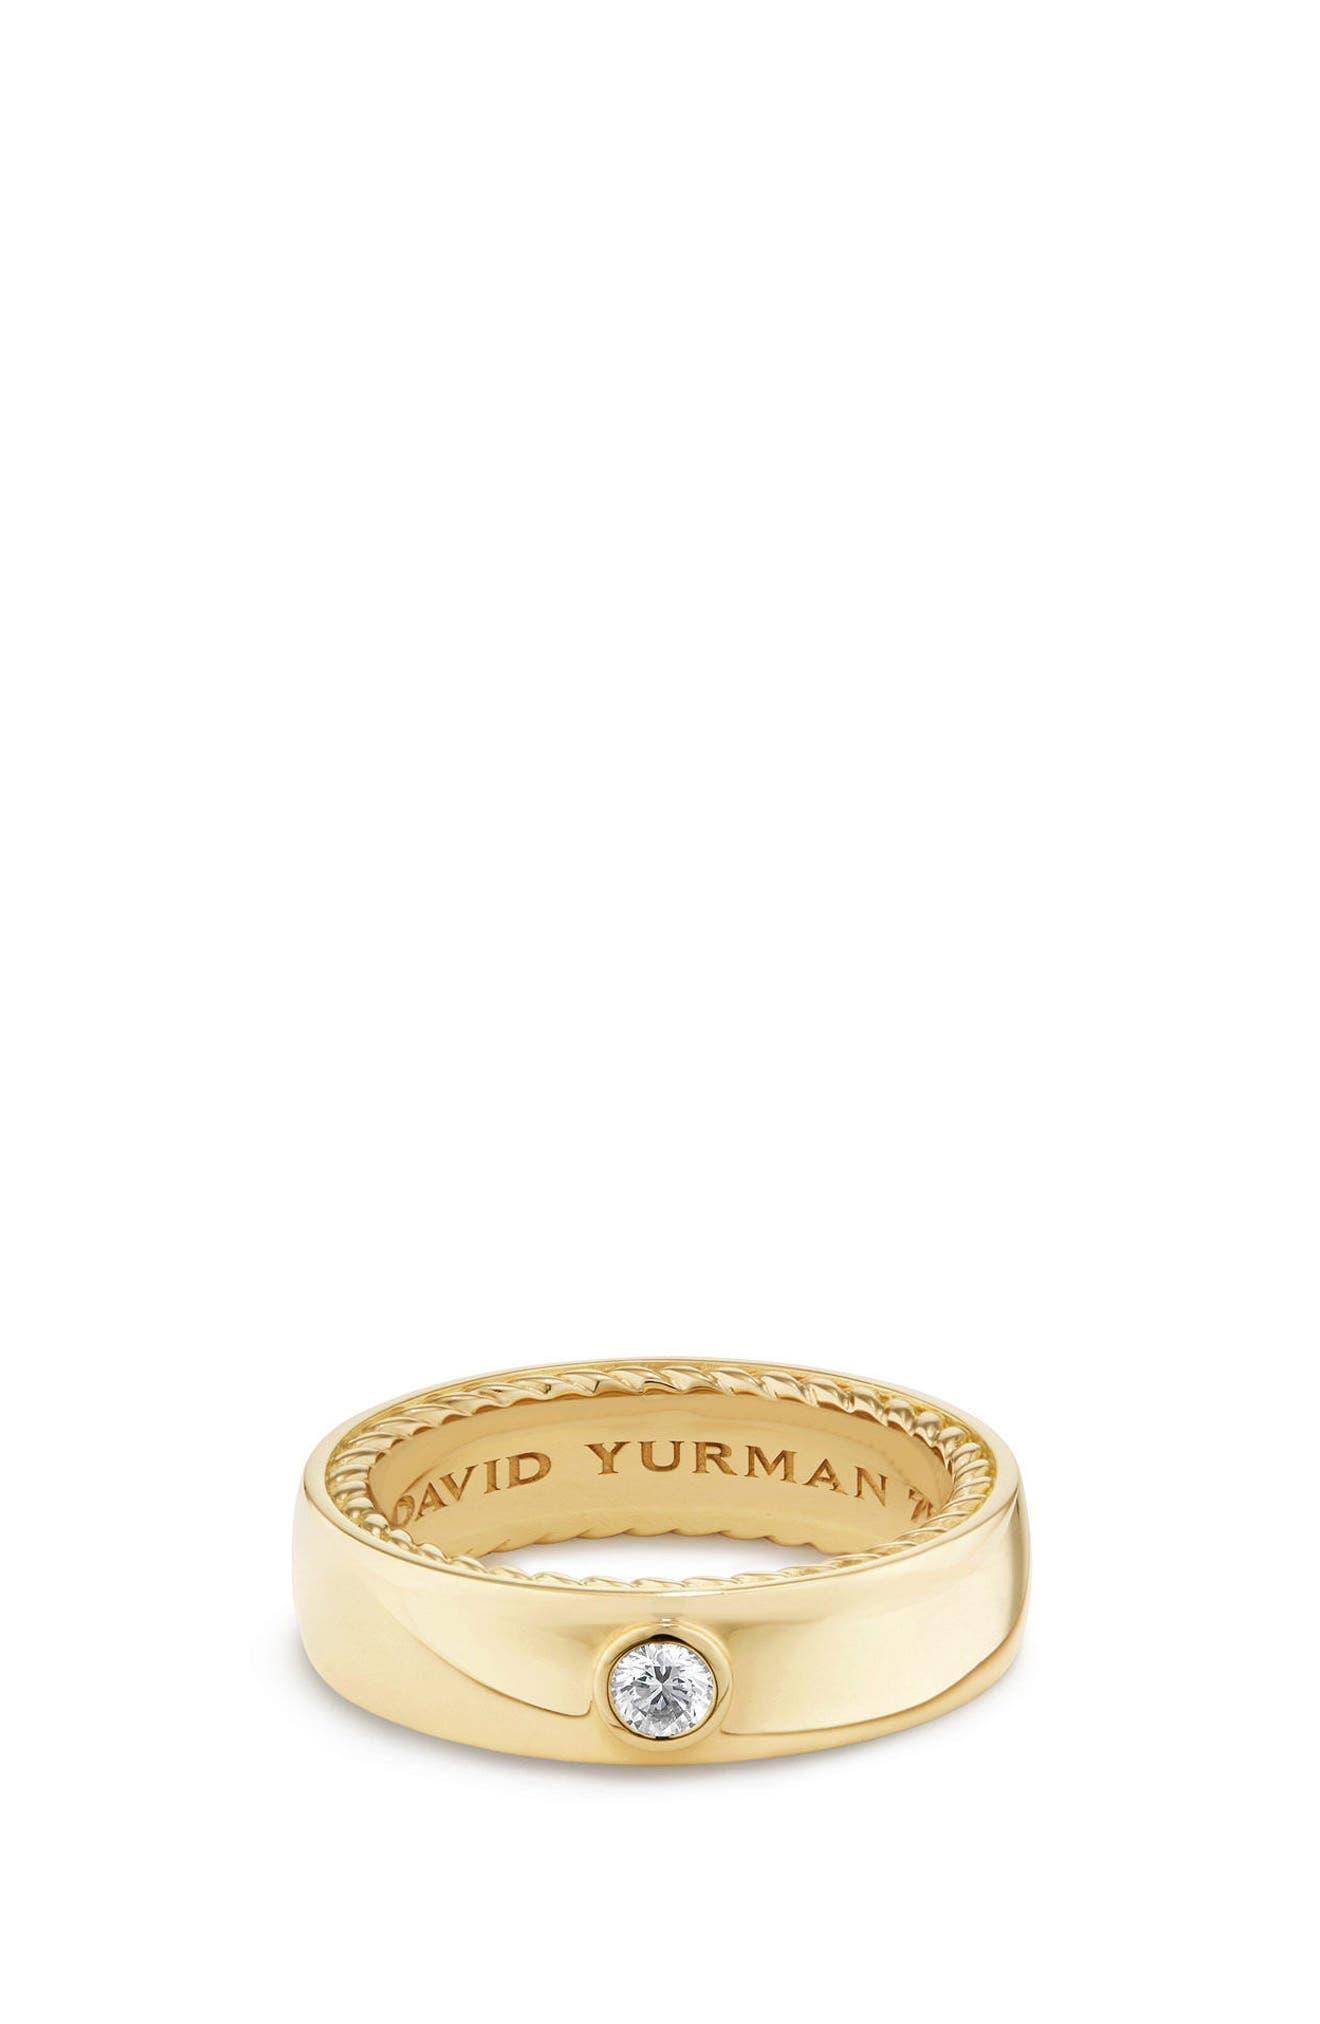 Main Image - David Yurman Streamline Band Ring with Diamond, 6mm